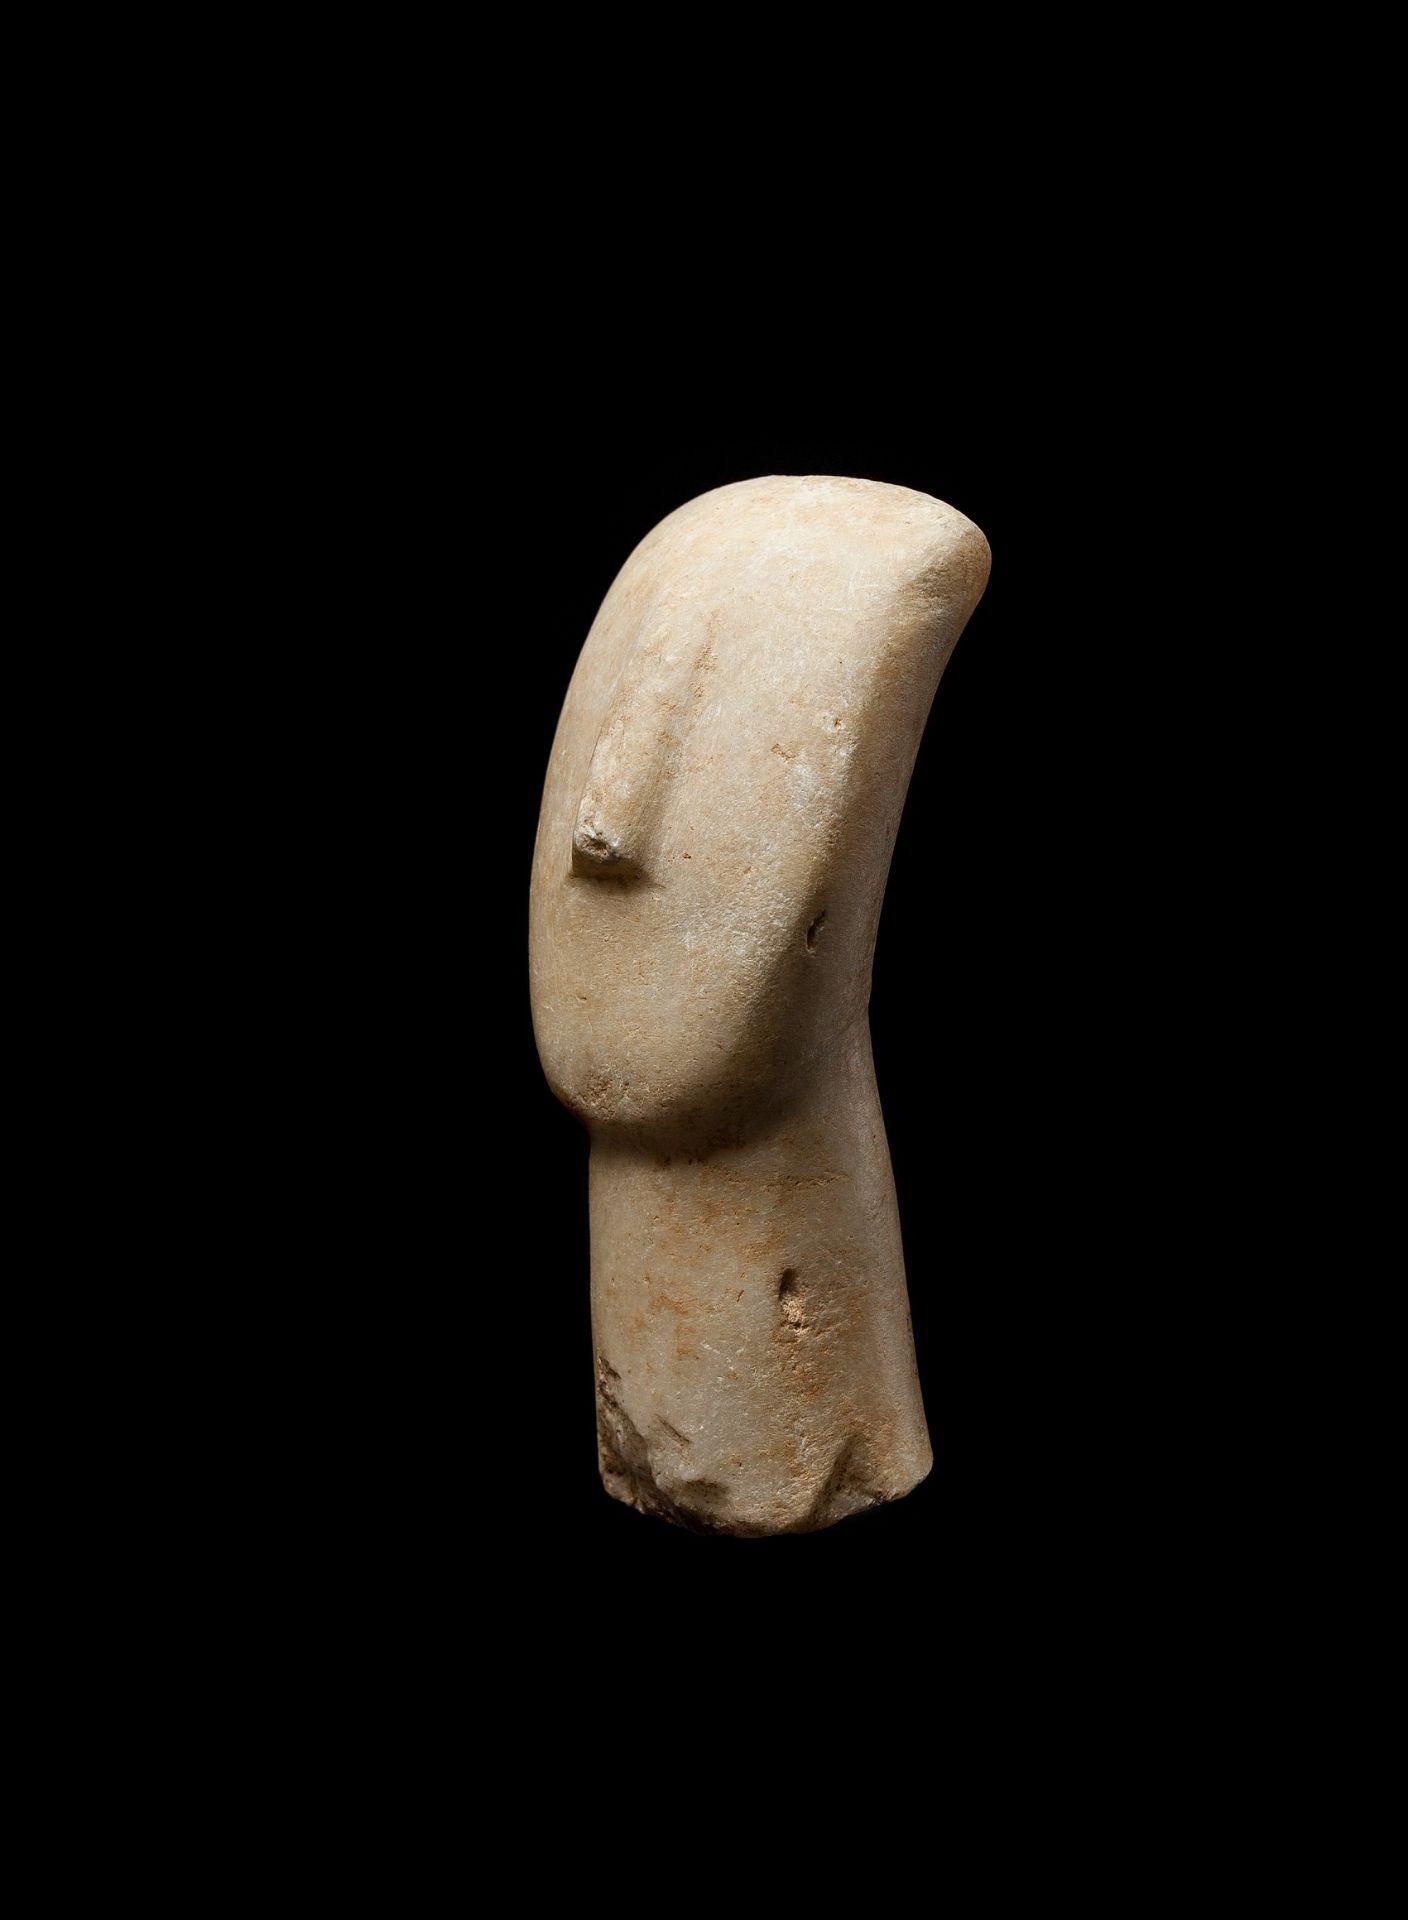 CYCLADIC IDOL HEAD CYCLADES, EARLY CYCLADIC II, C. 2600 - 2400 B.C. - Image 6 of 6